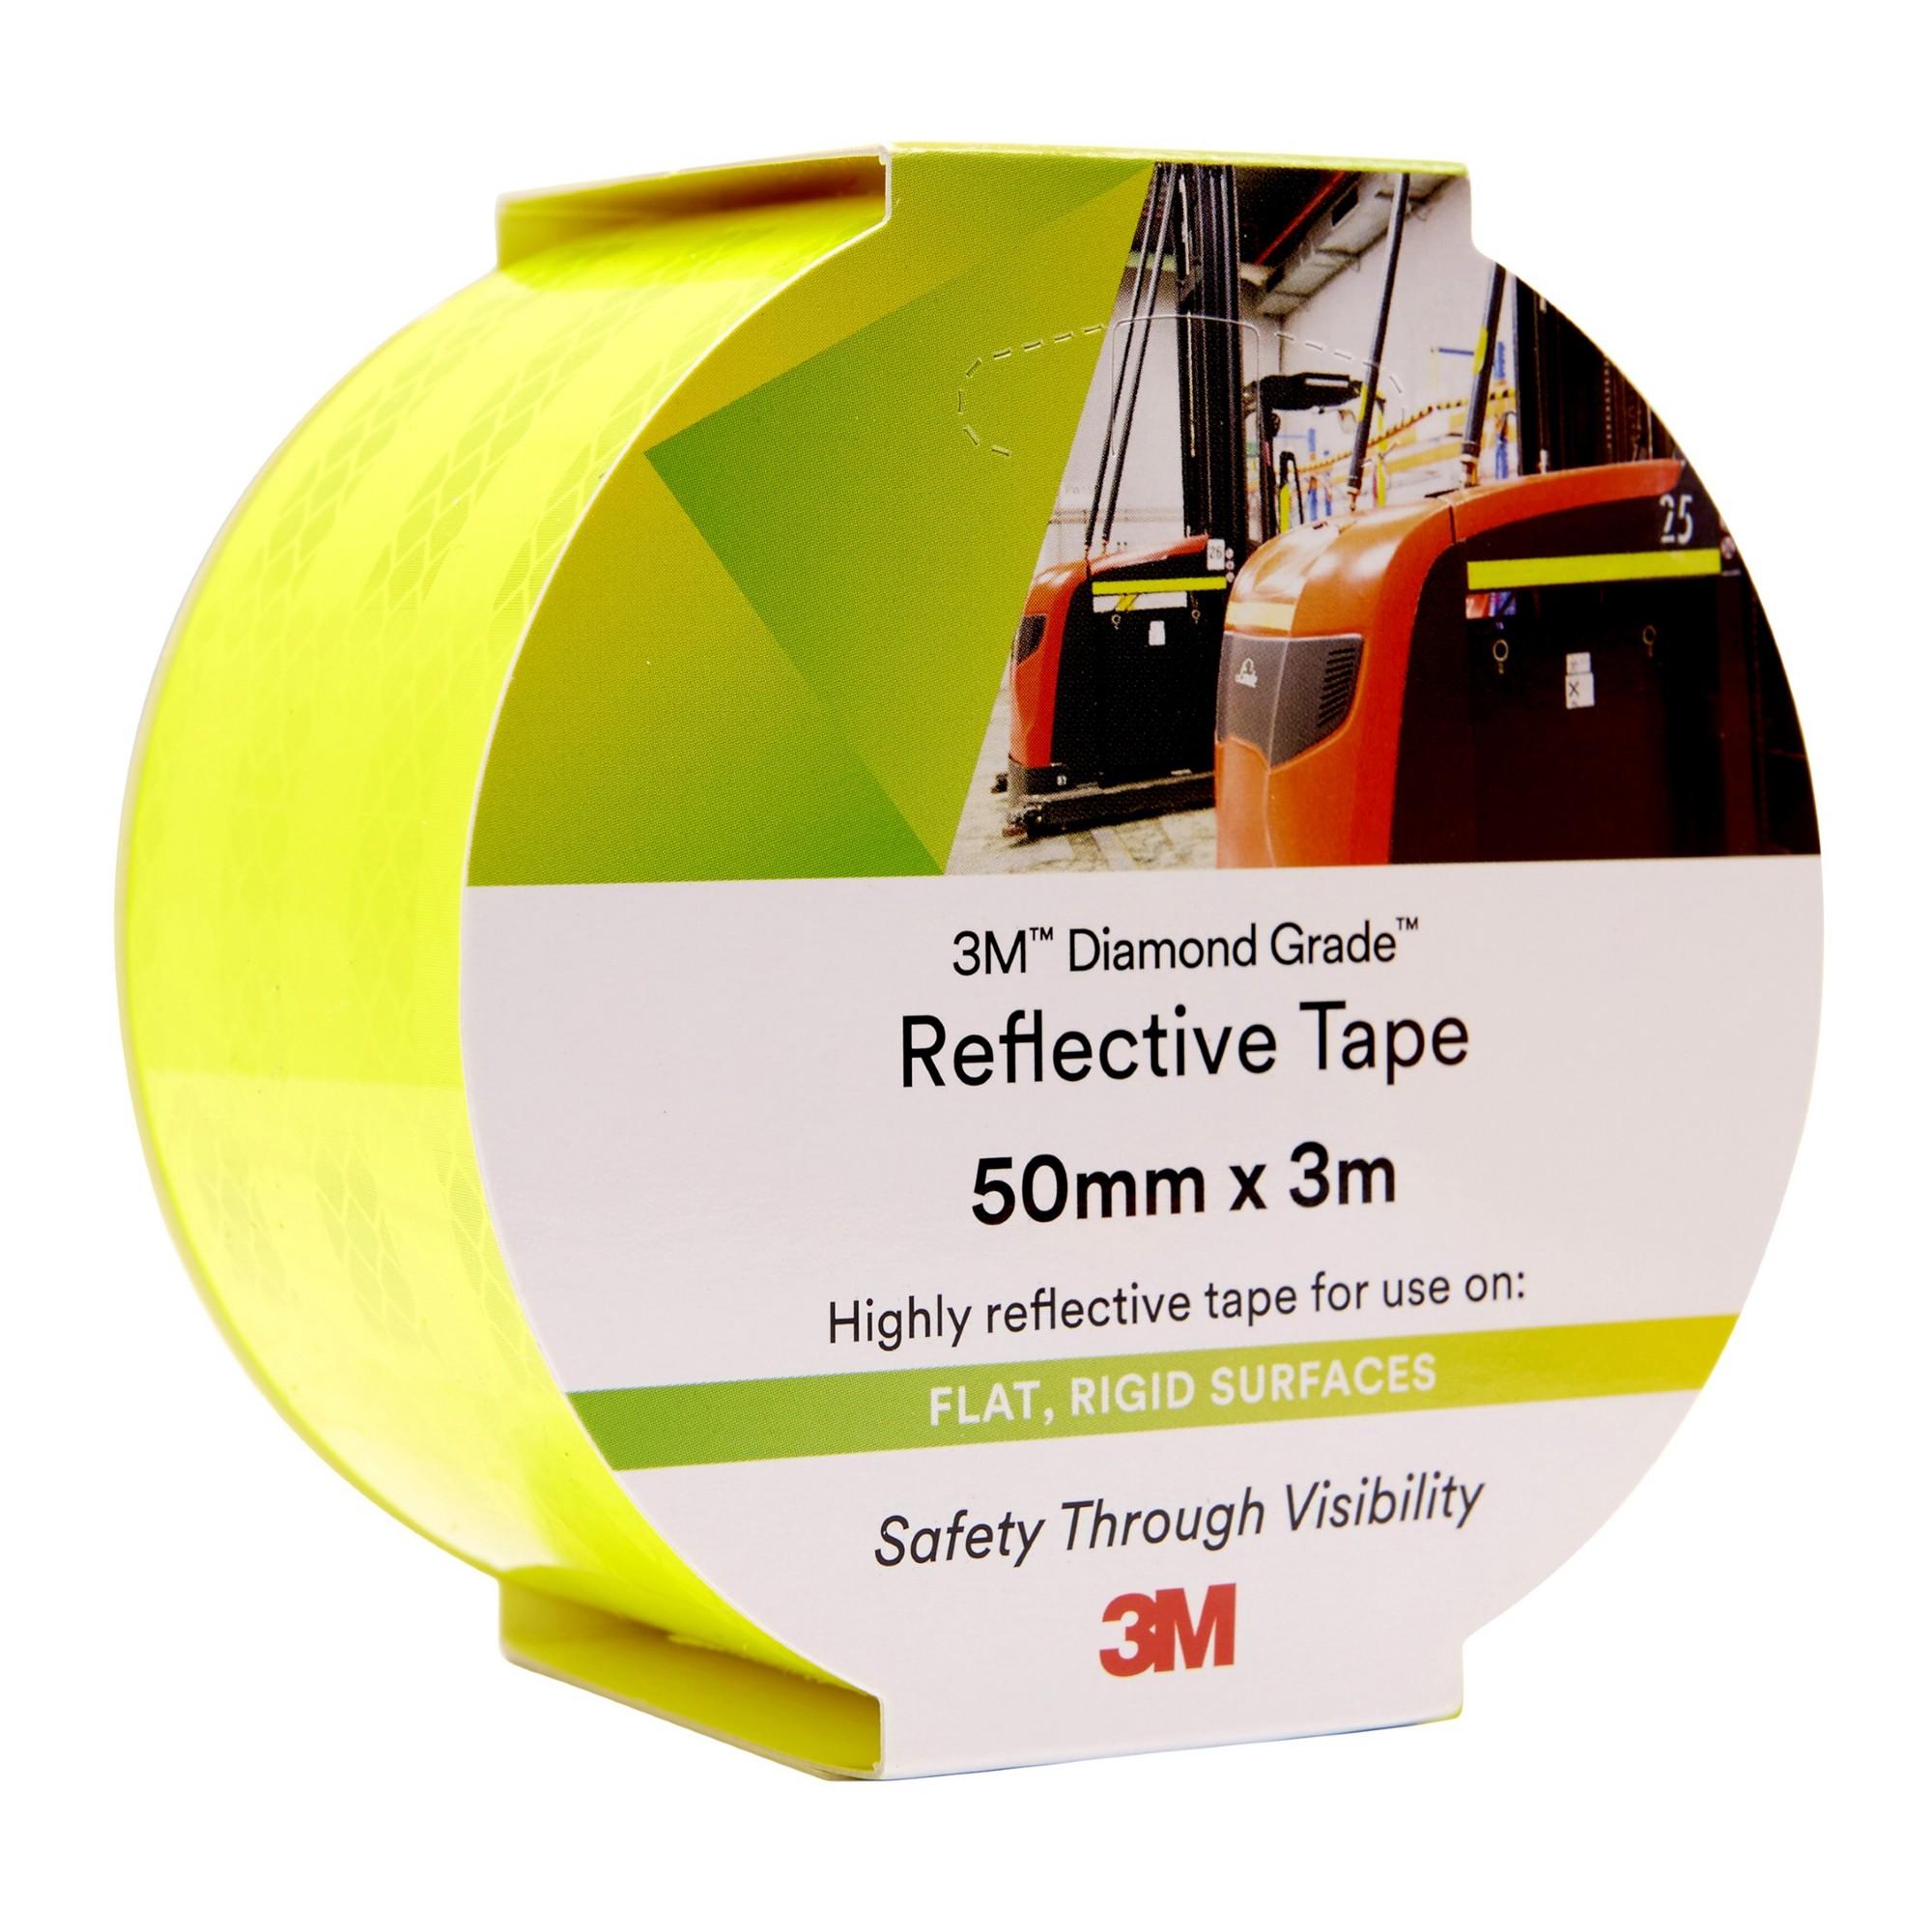 3M REFLECTIVE TAPE 3M 50MMX3M 983-23 DIAMOND GRADE FLURO YELLOW/GREEN ( EACH )